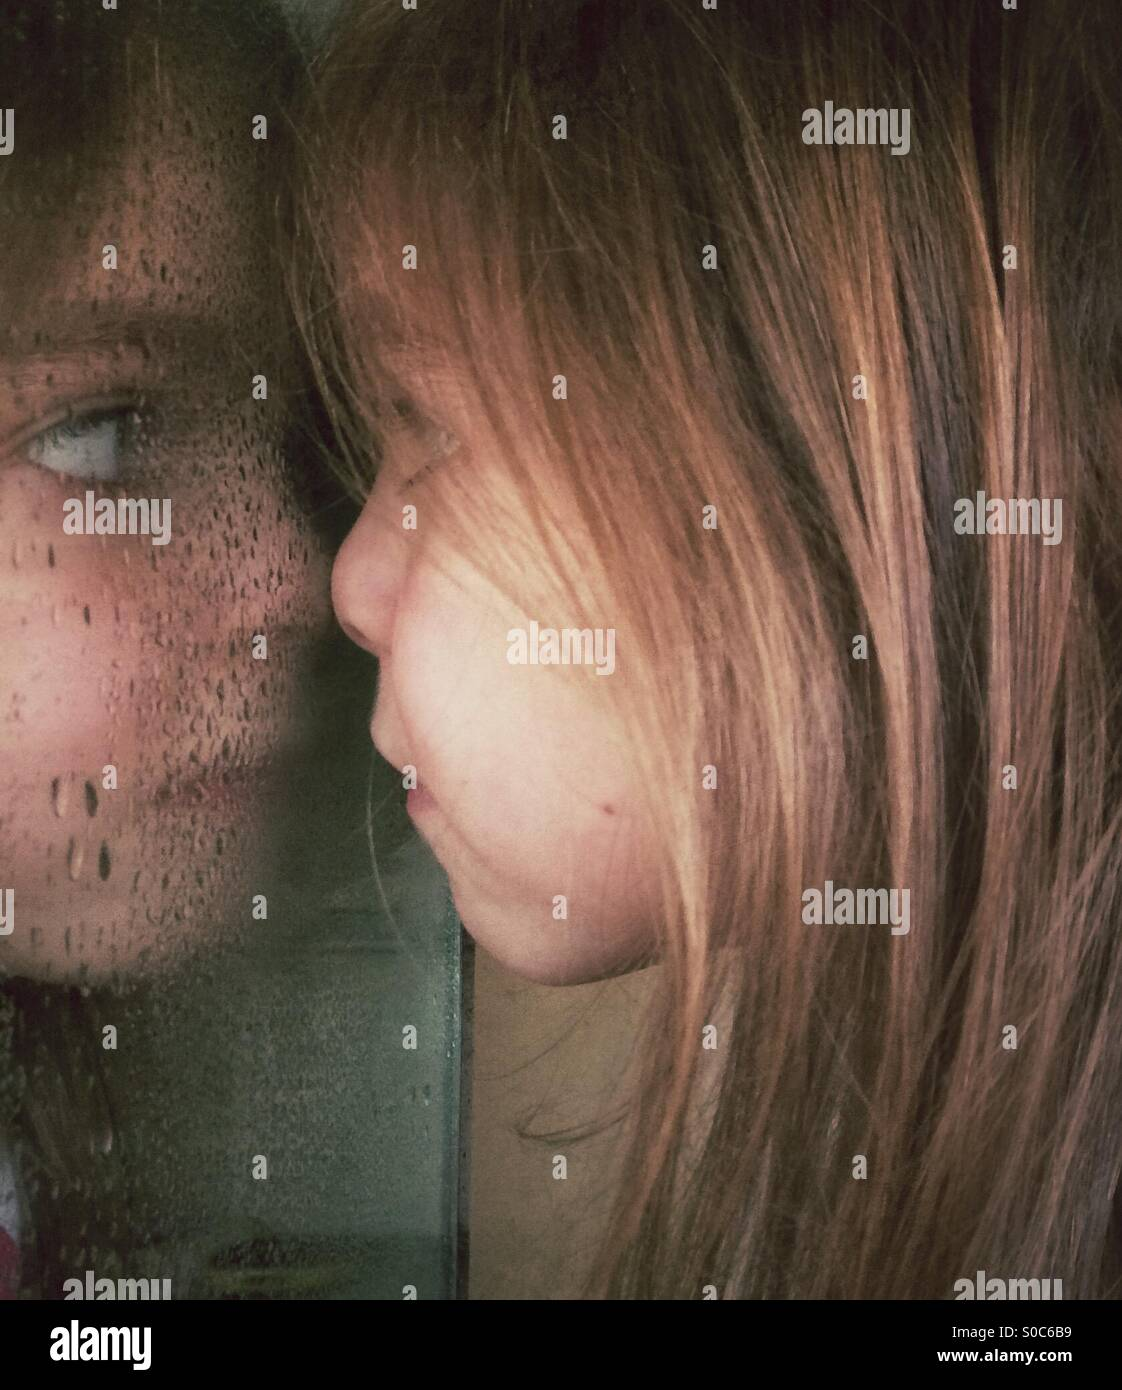 Girl pressing her nose against wet bathroom mirror - Stock Image